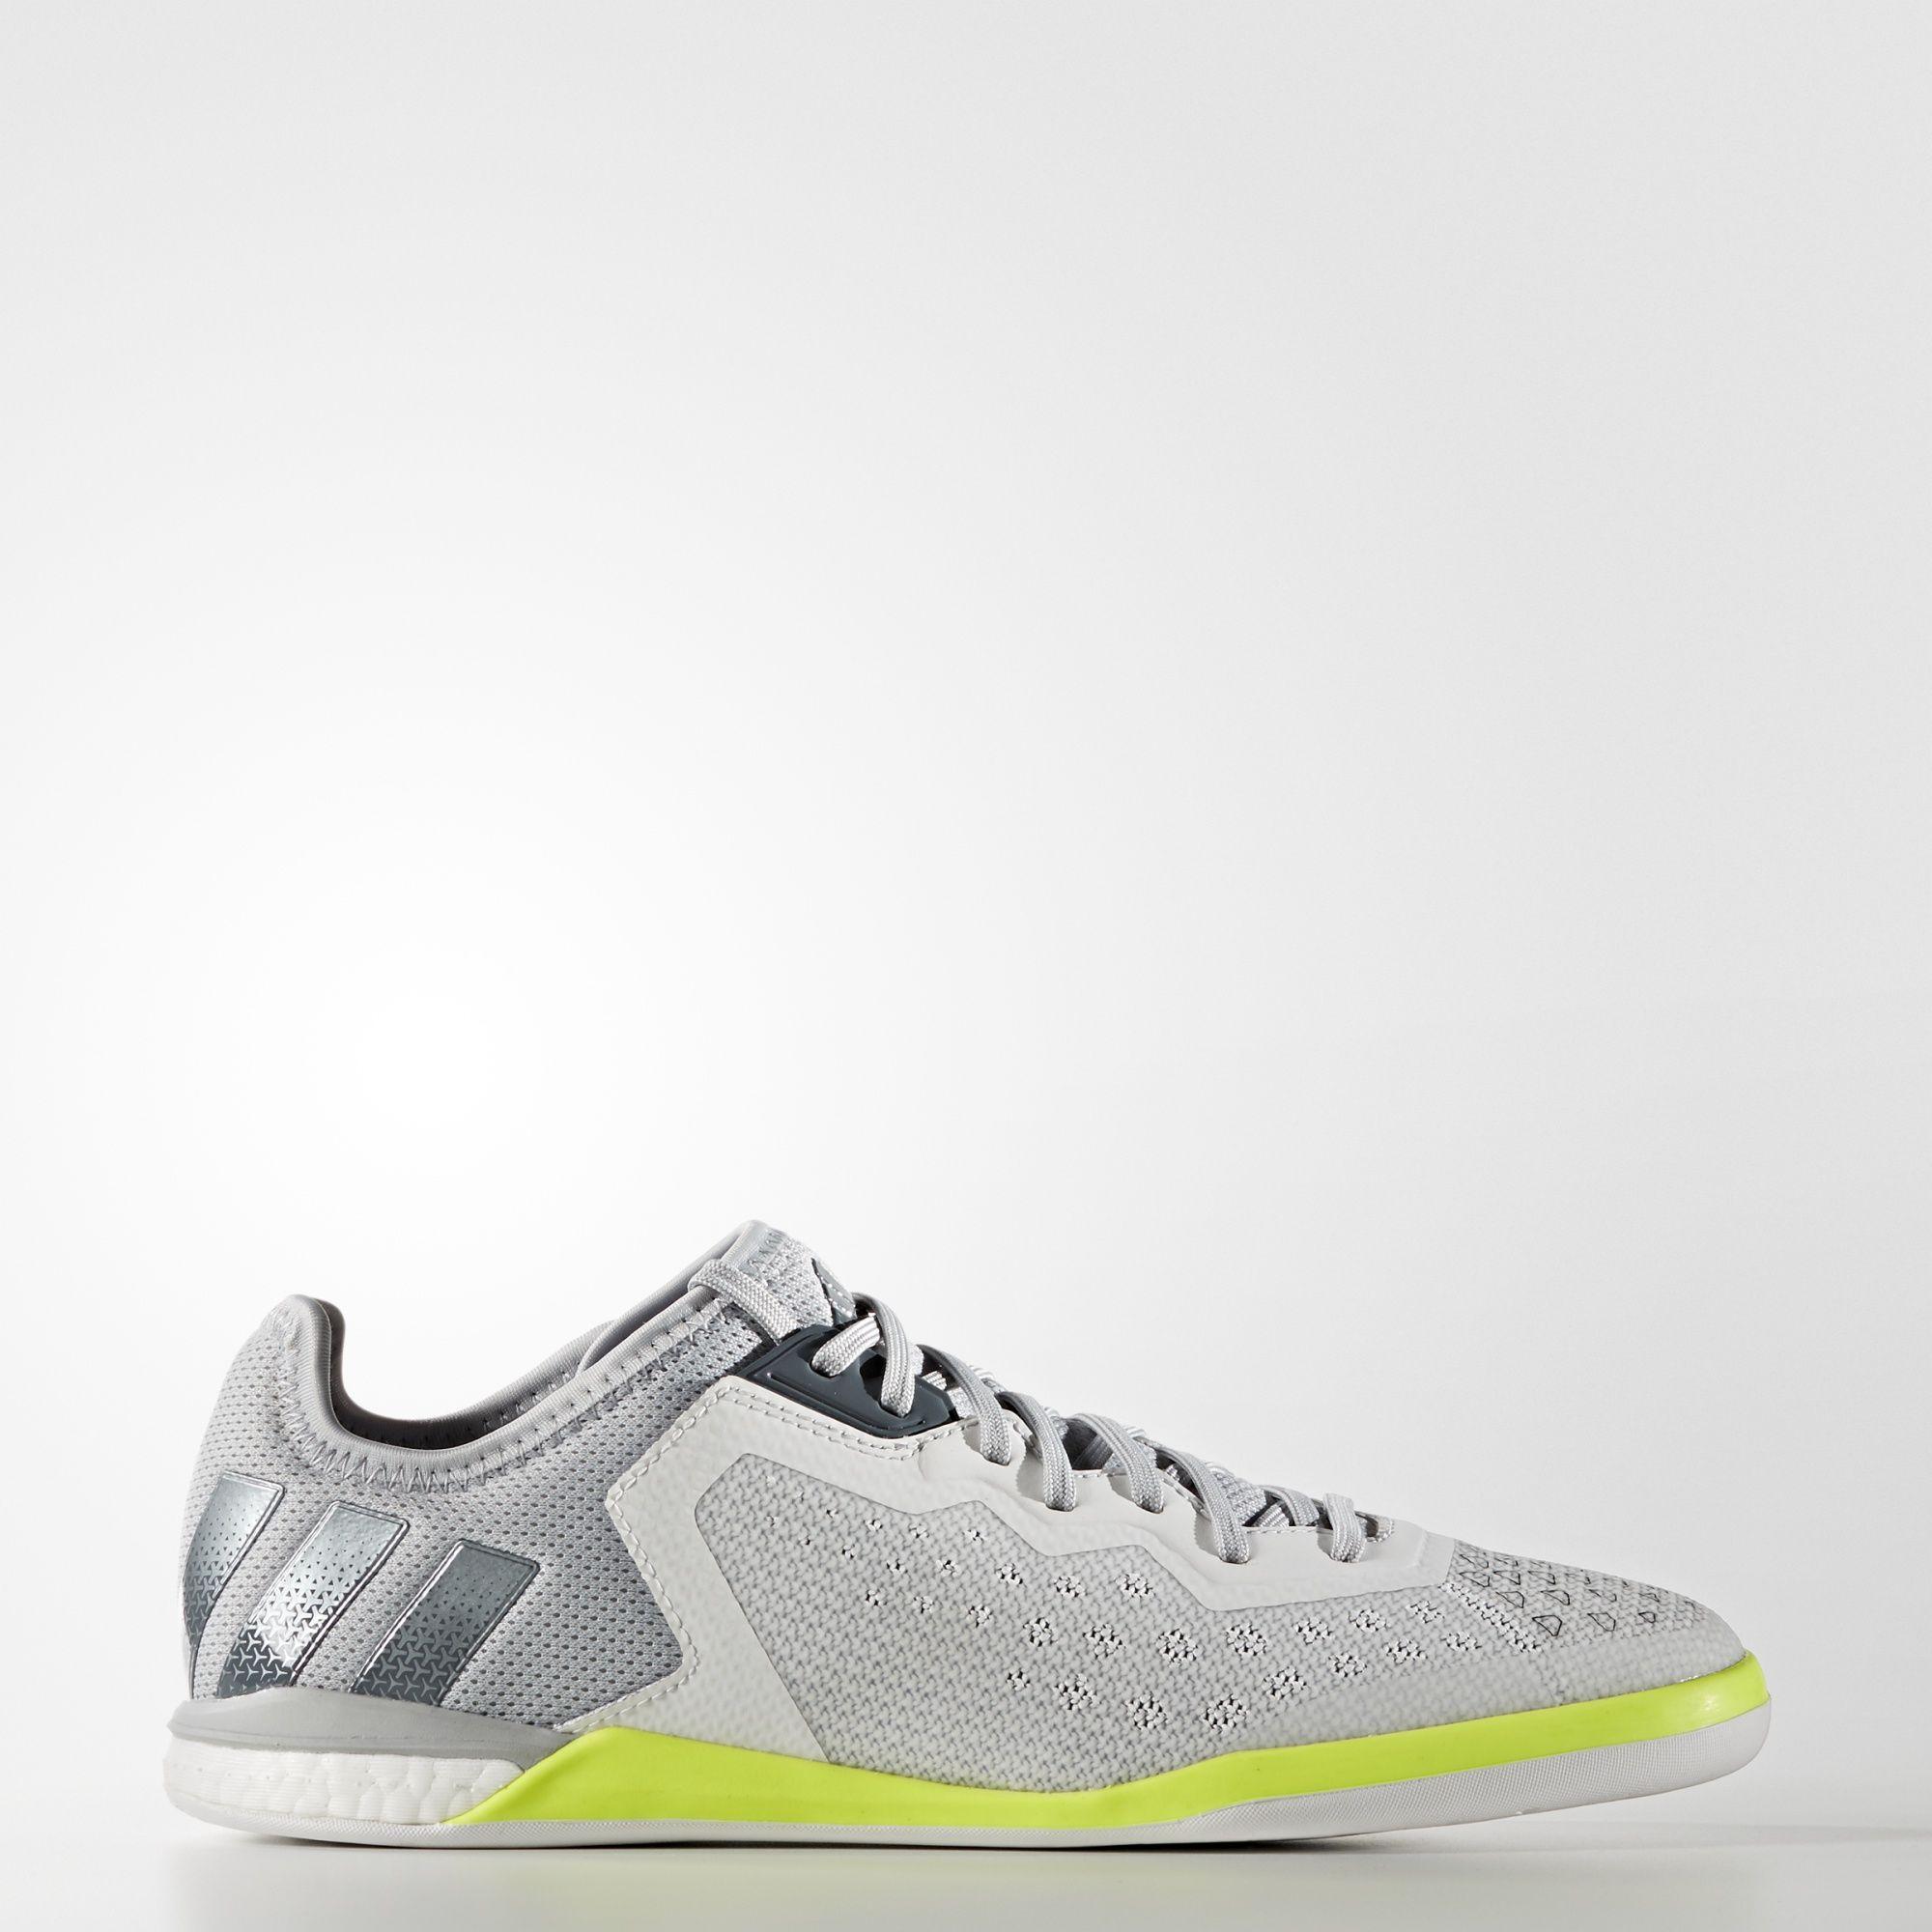 3a2561883897 ... new zealand adidas ace 16.1 court white yellow 78186 b22e3